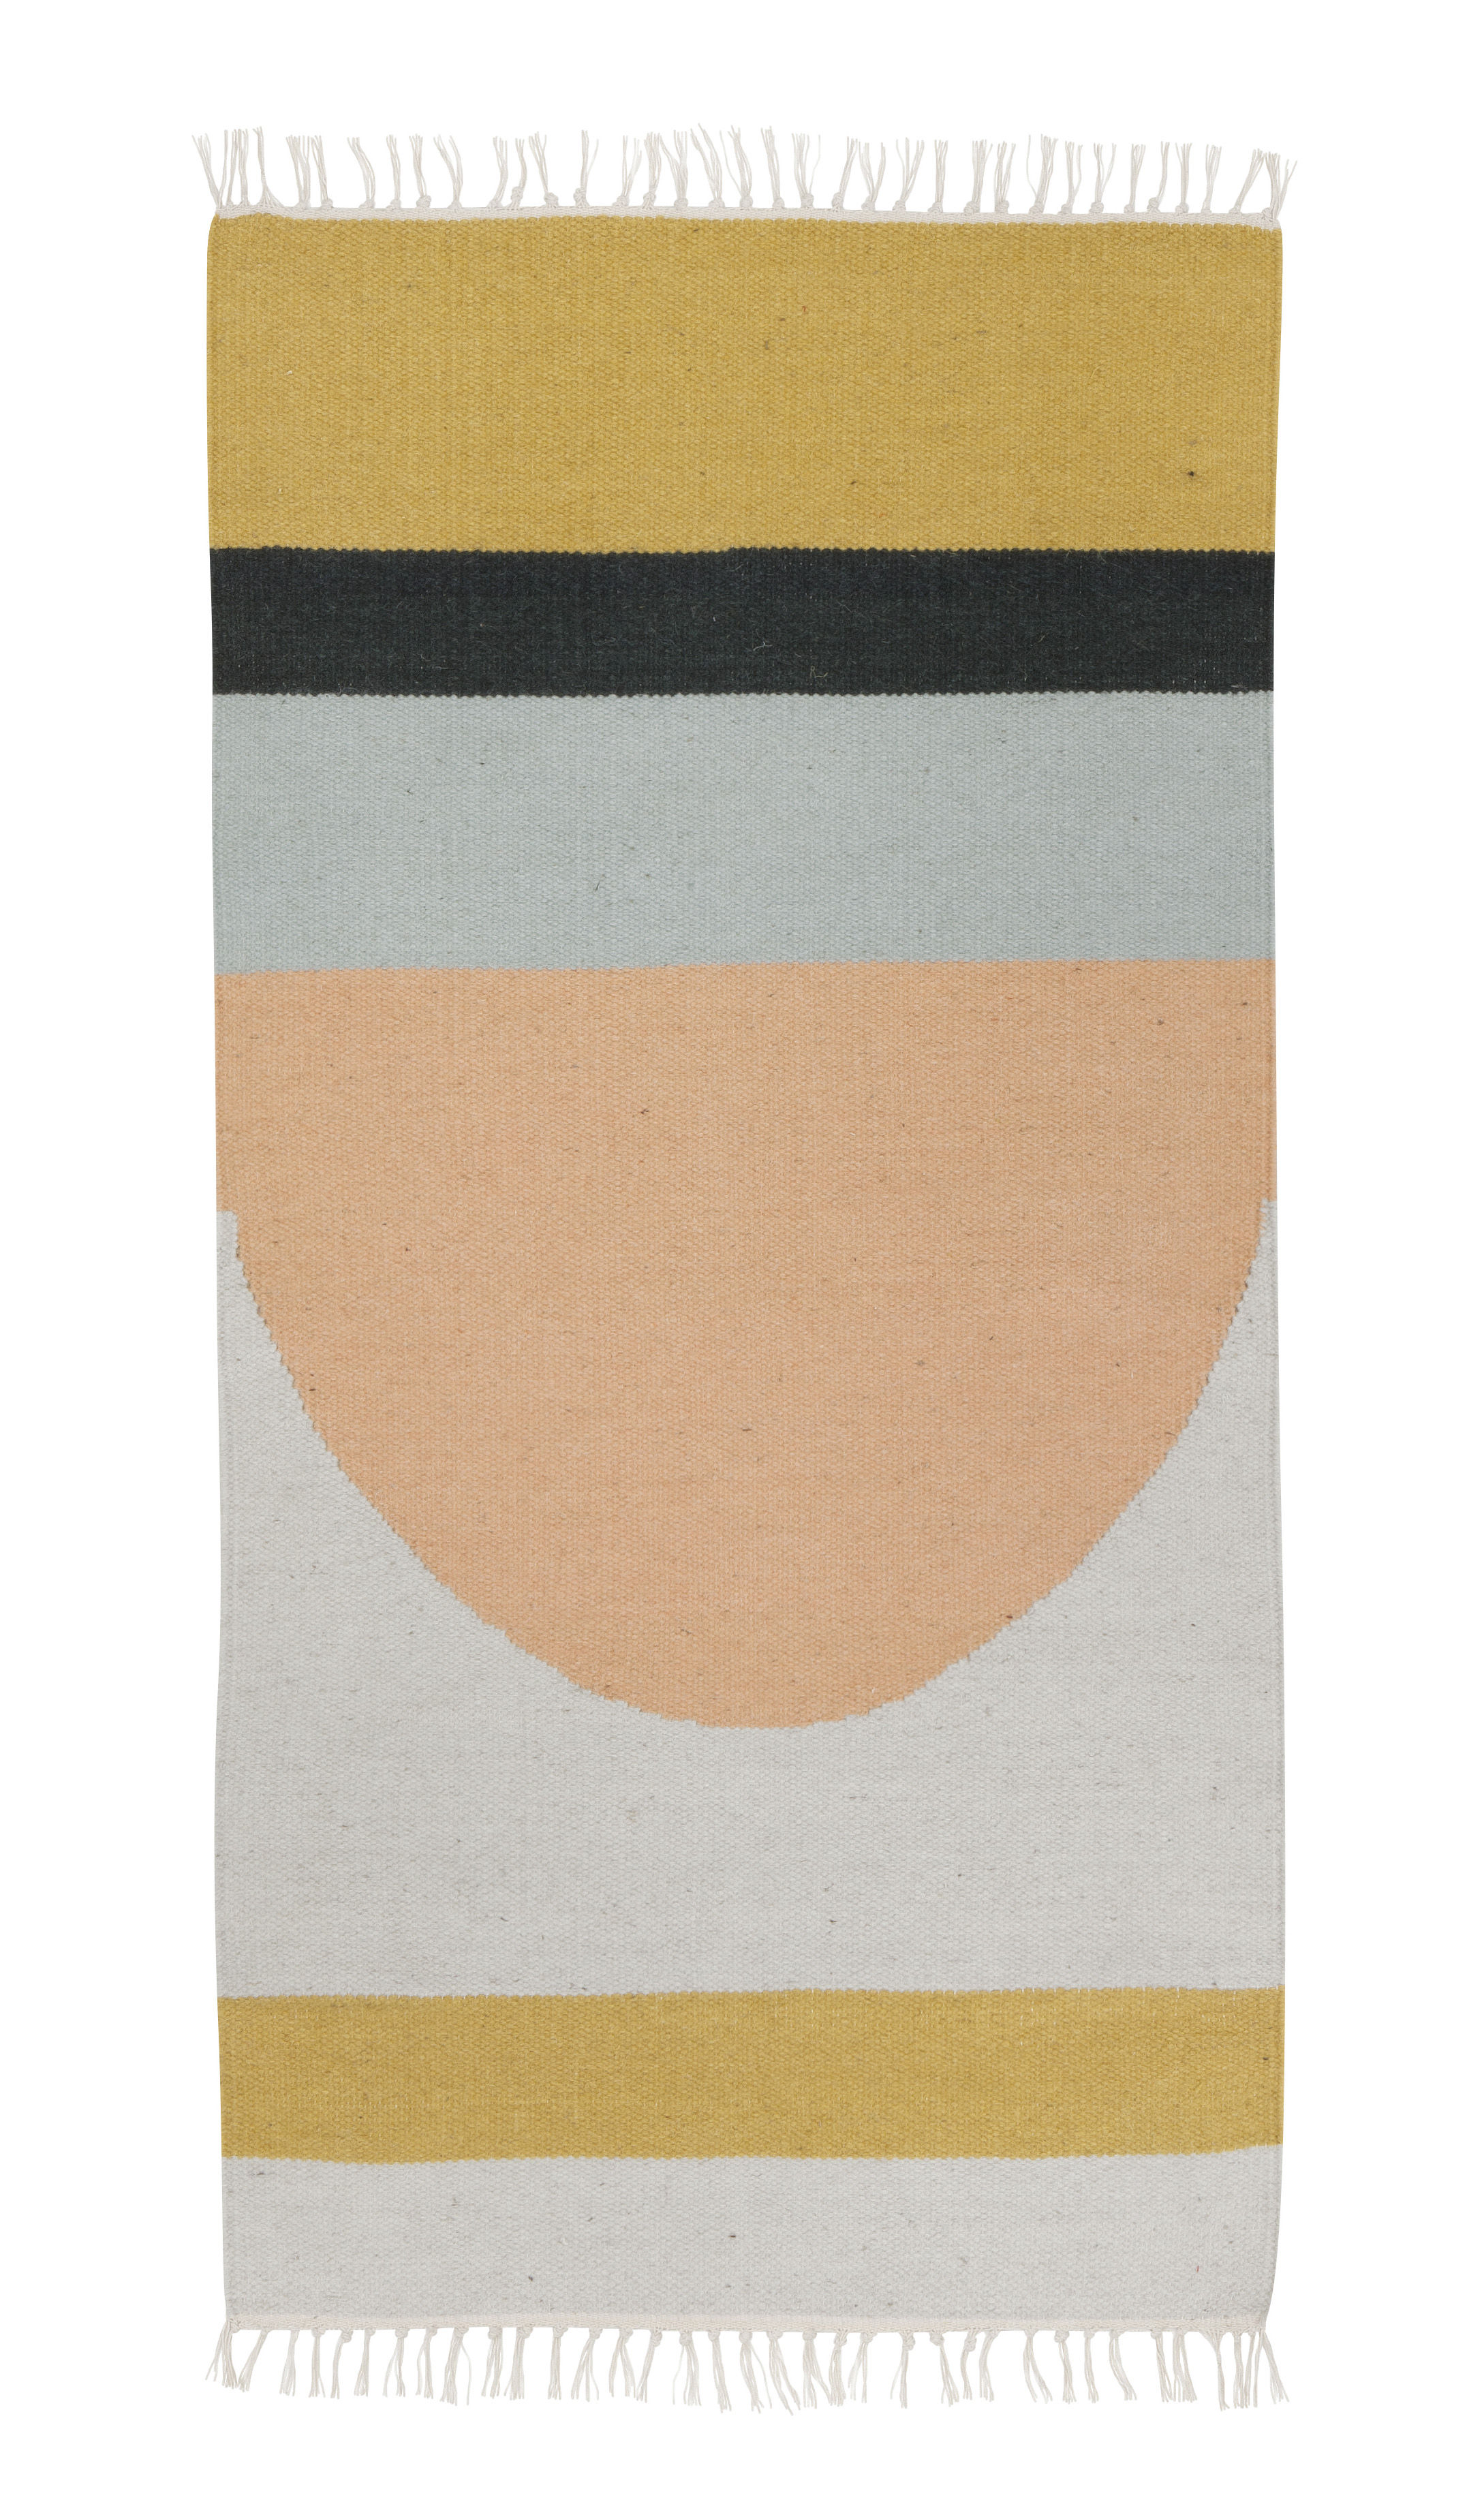 Tapis kelim semi circle 140 x 80 cm 140 x 80 cm - Made in design tapis ...